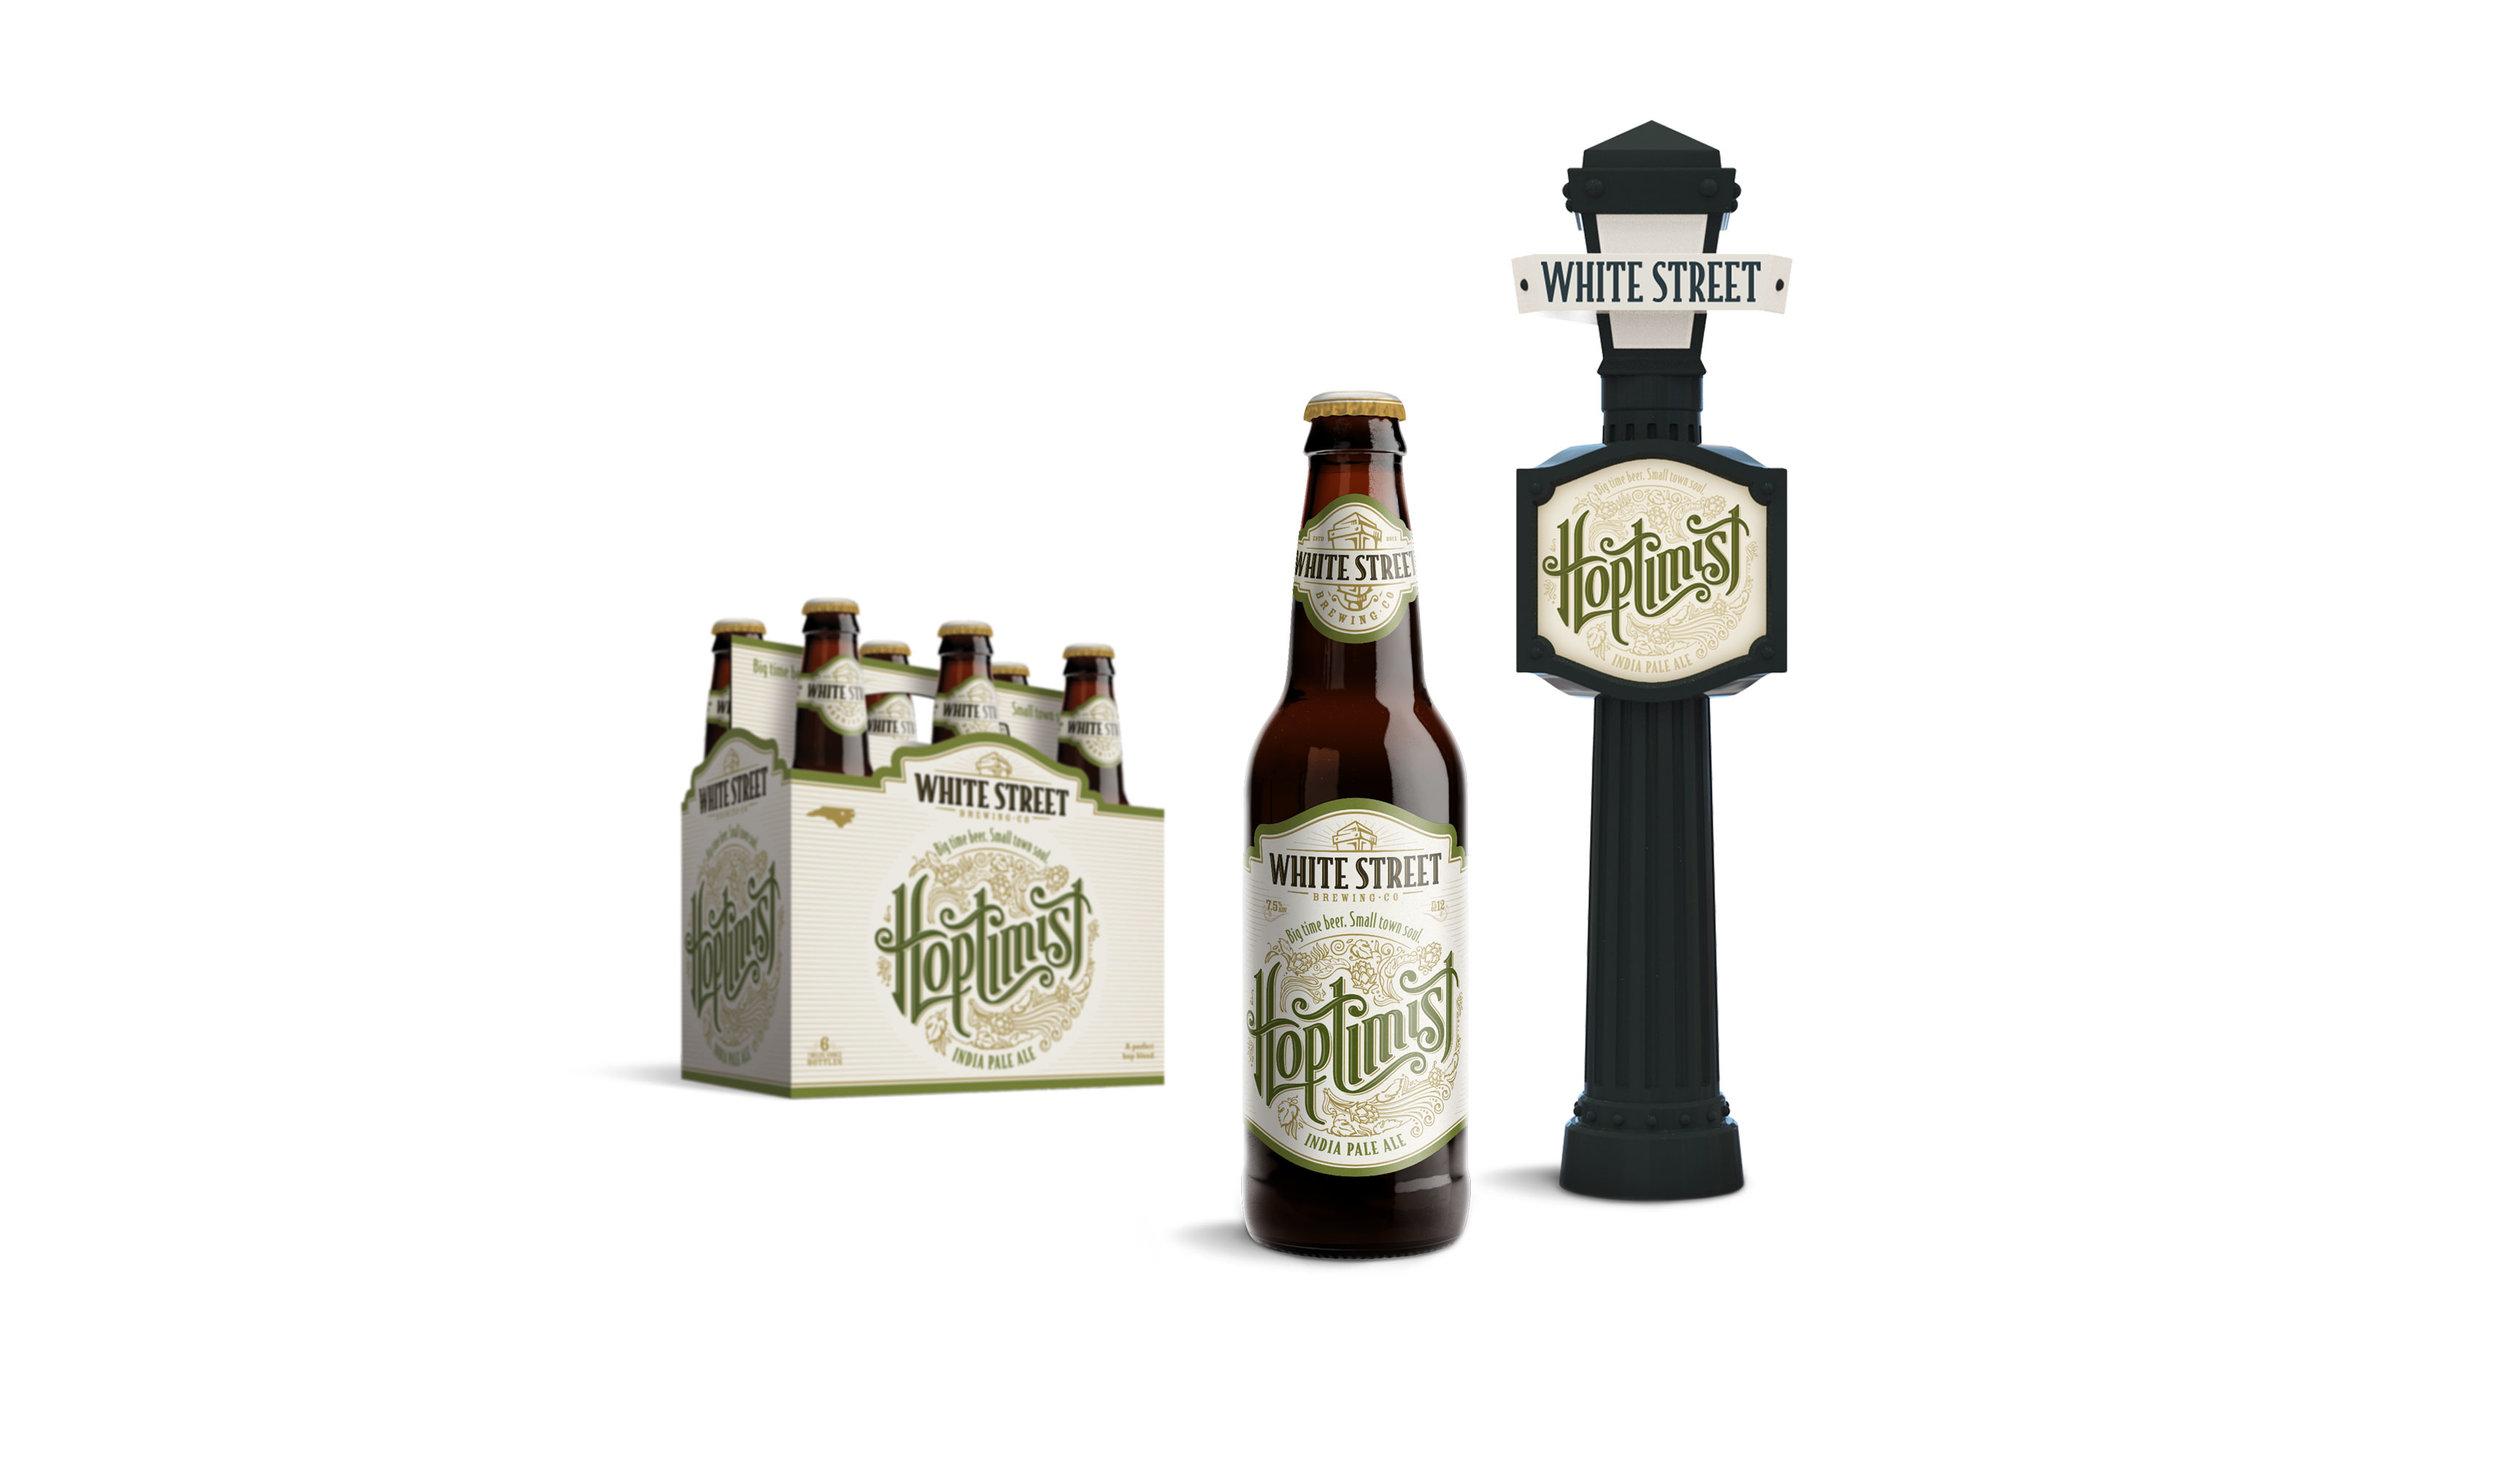 Craft-Beer-Branding-White-Street-Brewing-Co-Hoptimist-Product-Design.jpg